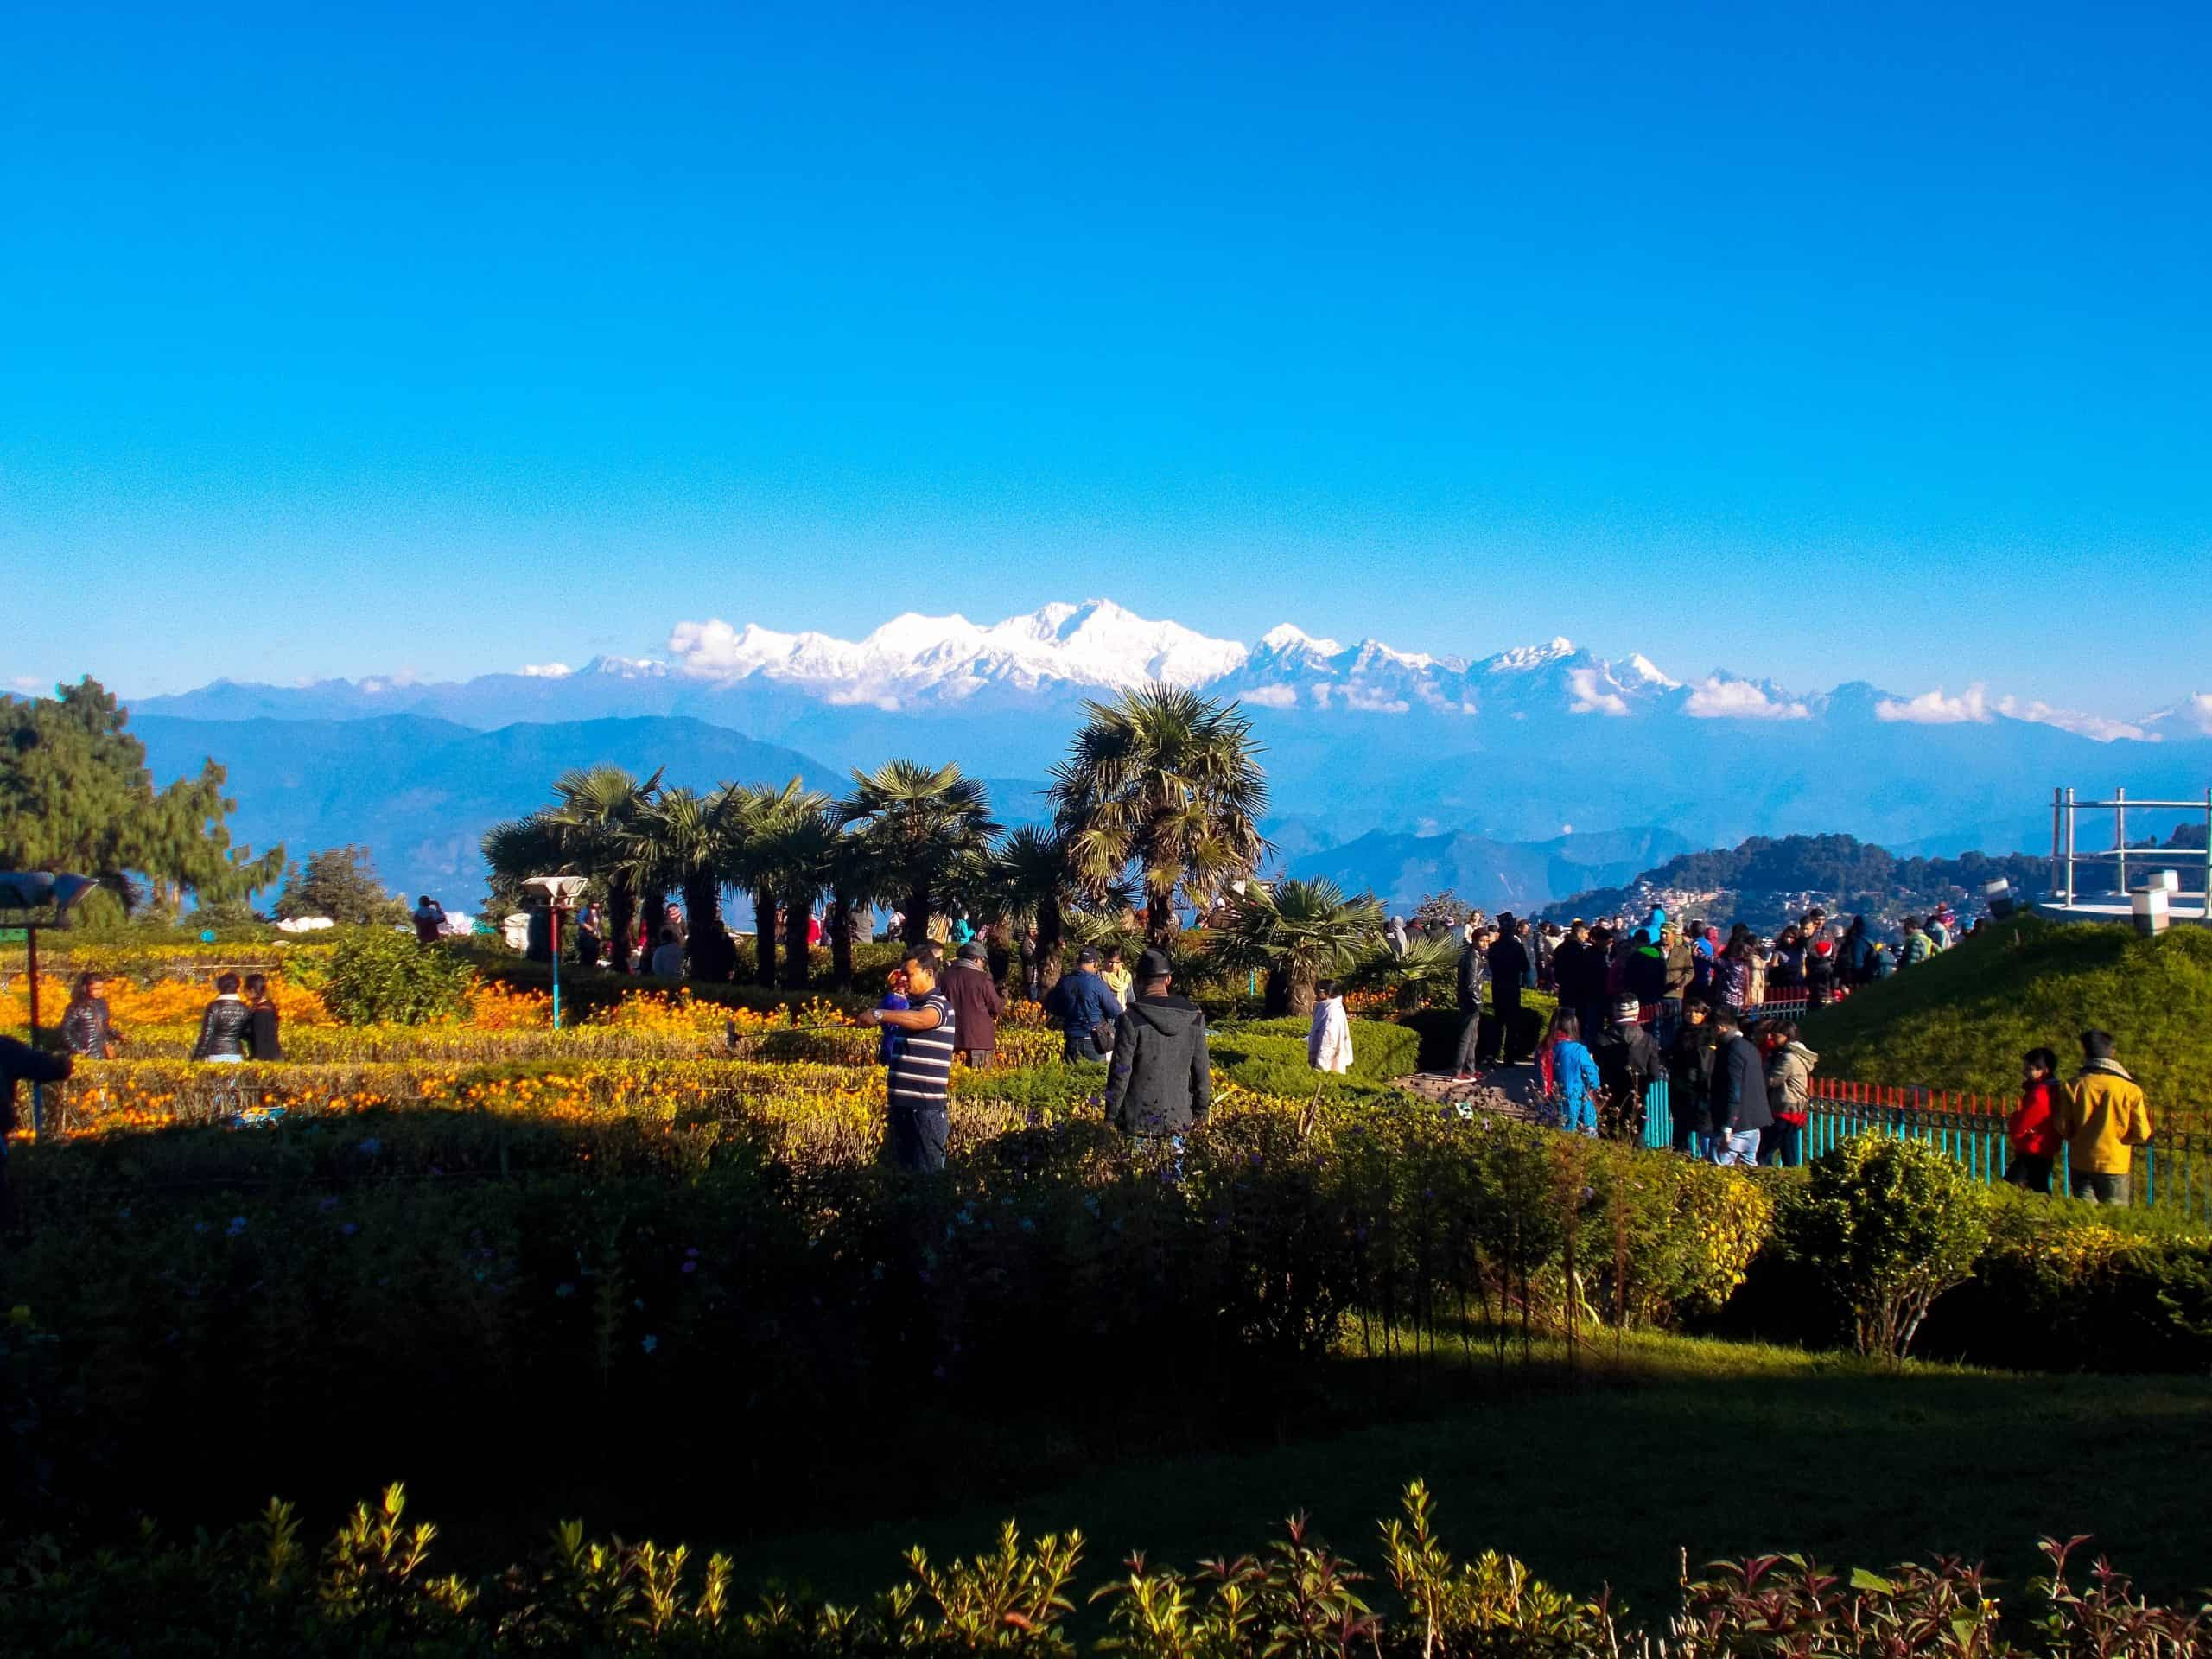 View from Batasia Loop, Darjeeling Himalayan Railway, India